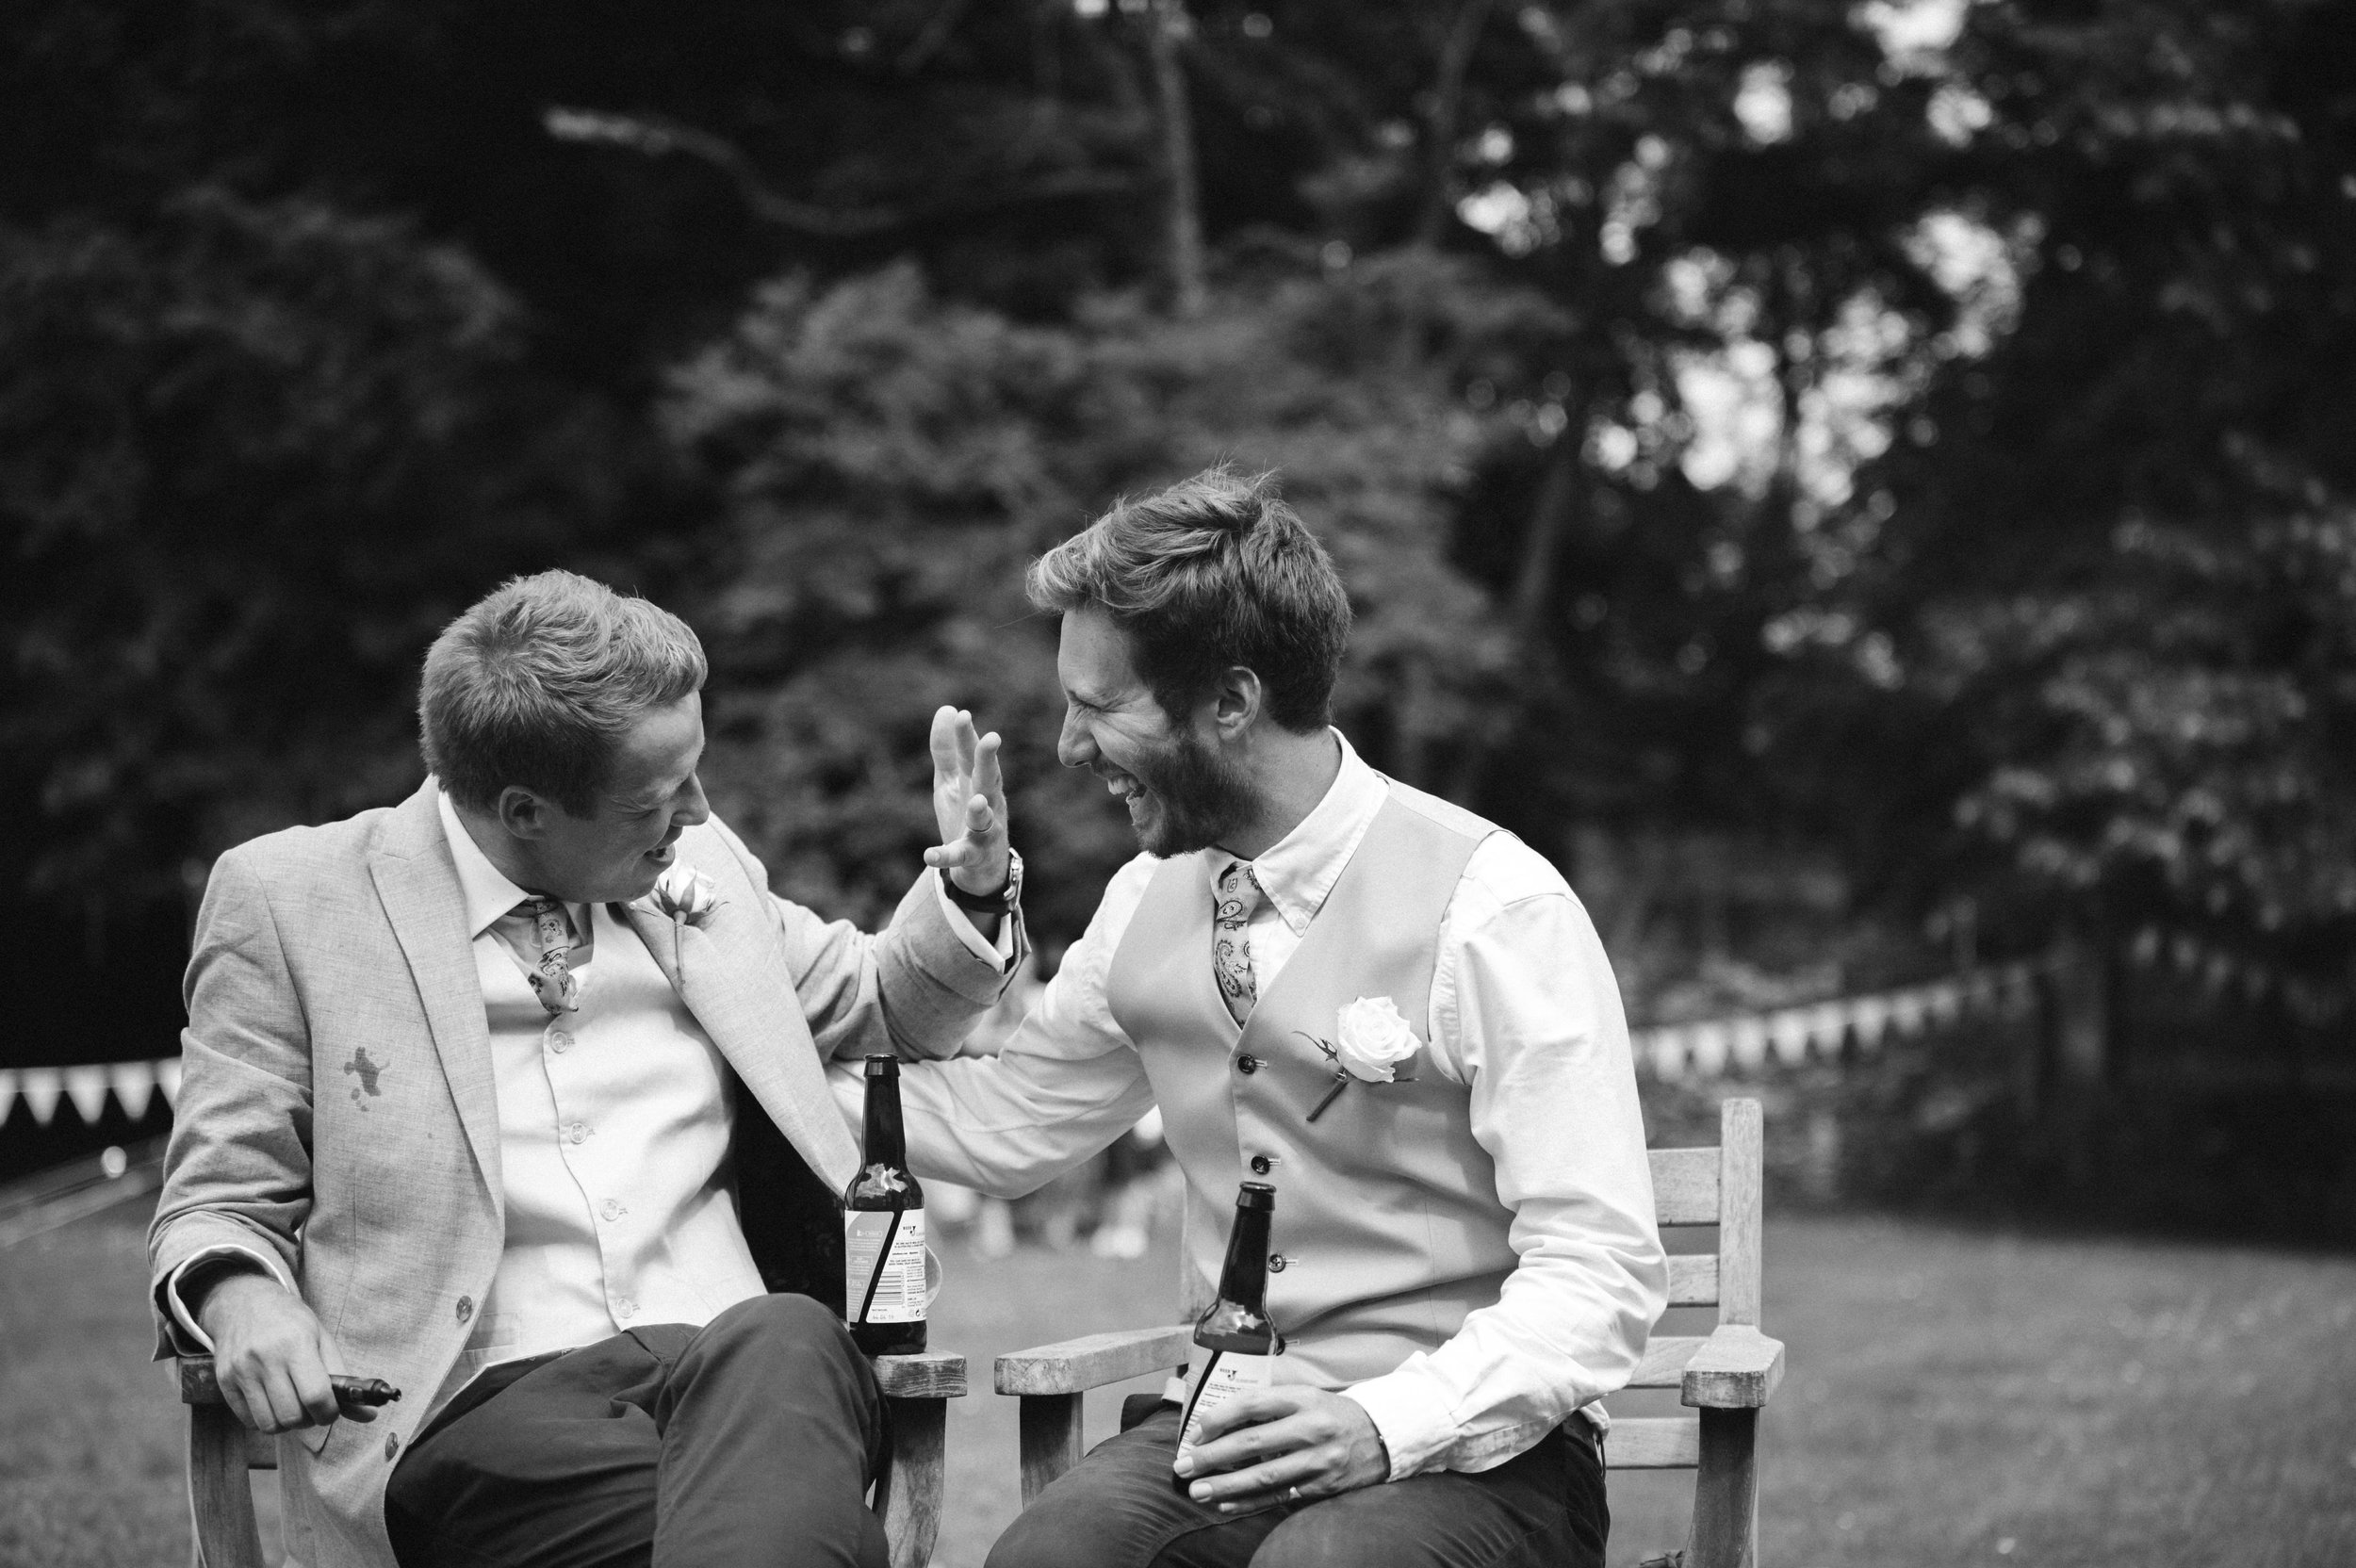 wedding-photographer-dordogne-mark-shaw-41.jpg